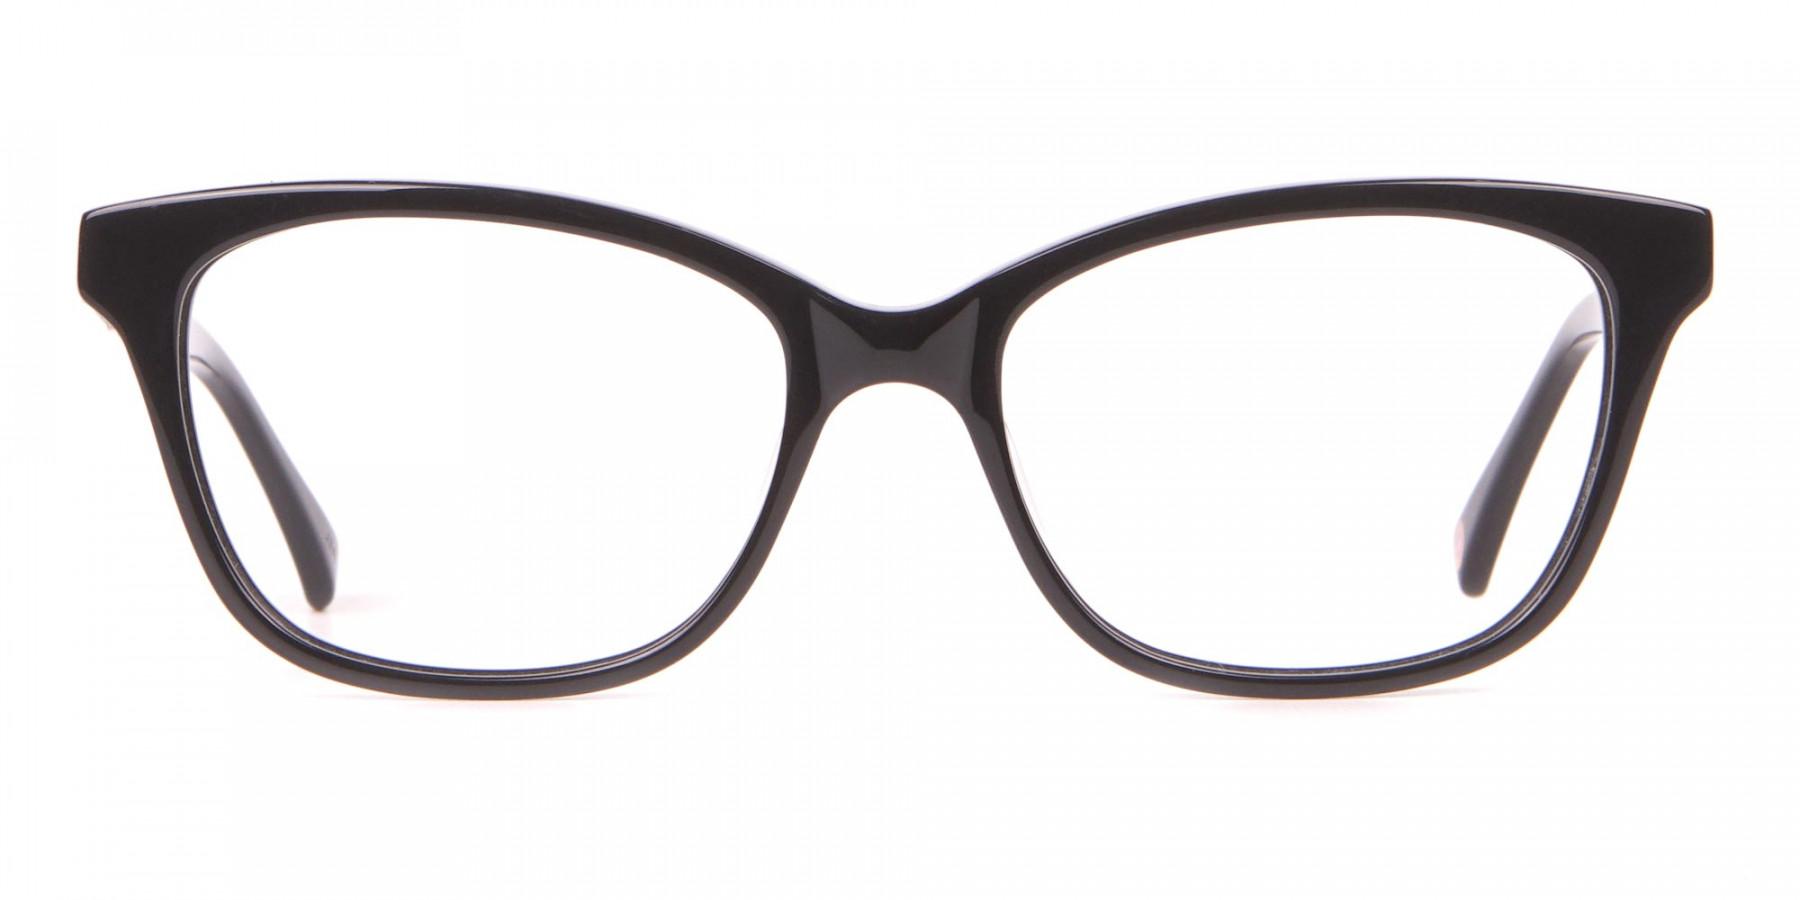 Ted Baker TB9124 SENNA Women's Black Cateye Glasses-1